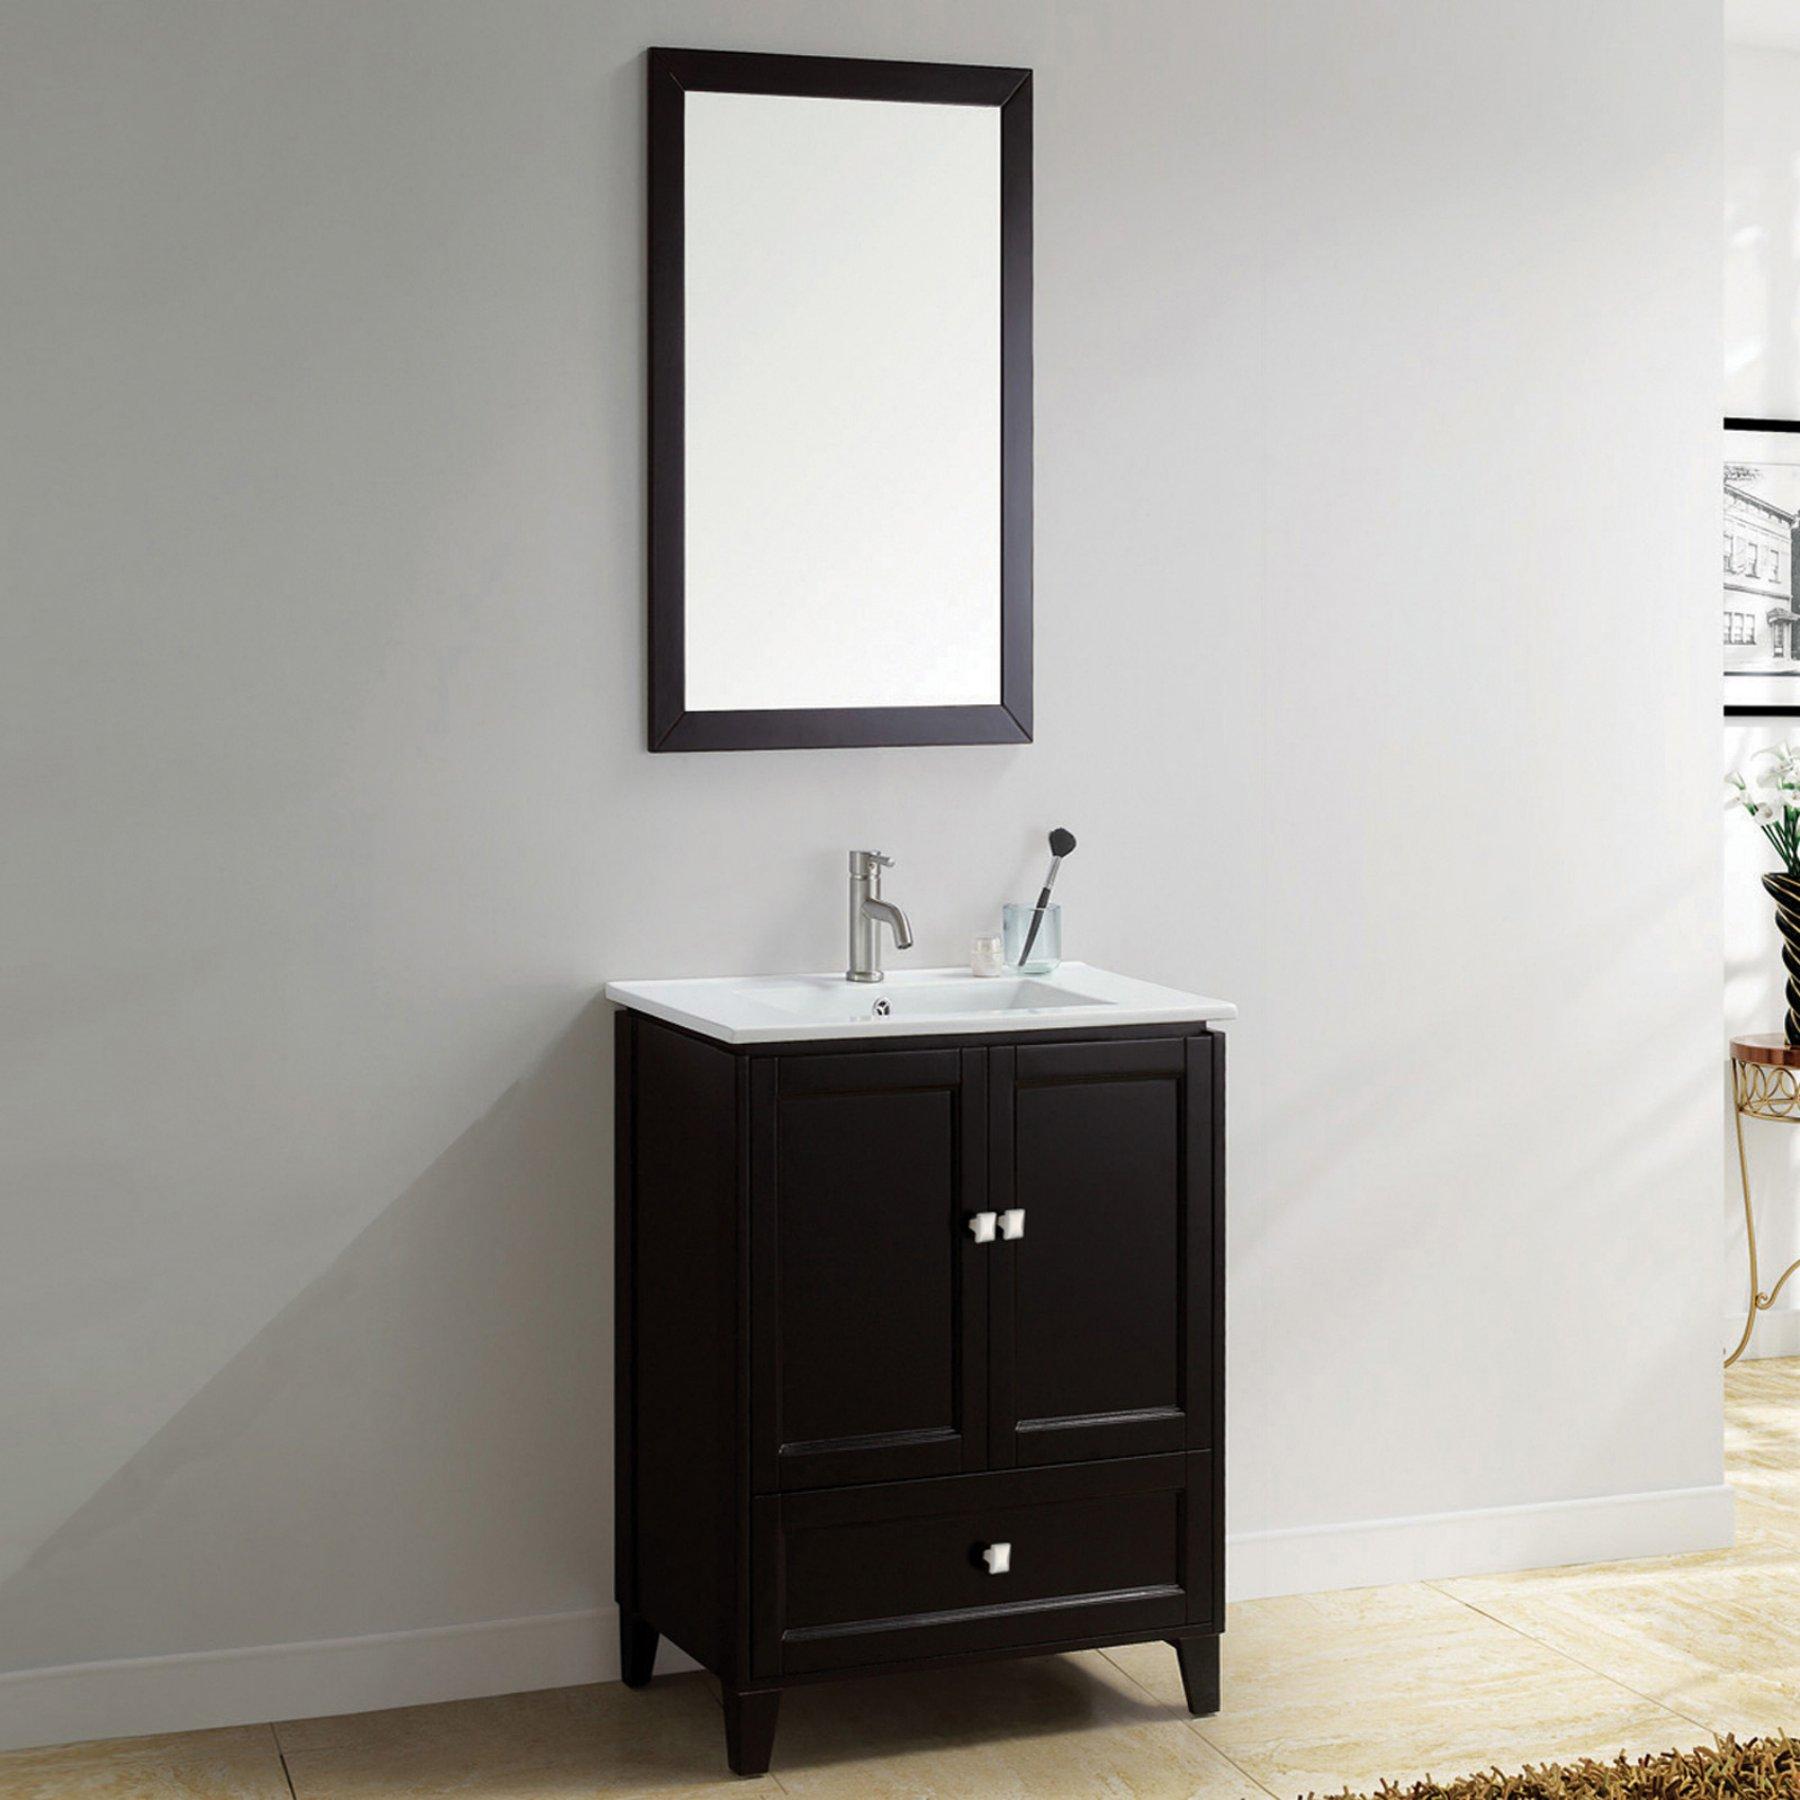 Adornus Lombardi Single Bathroom Vanity With Mirror  Lombardi 24 E C